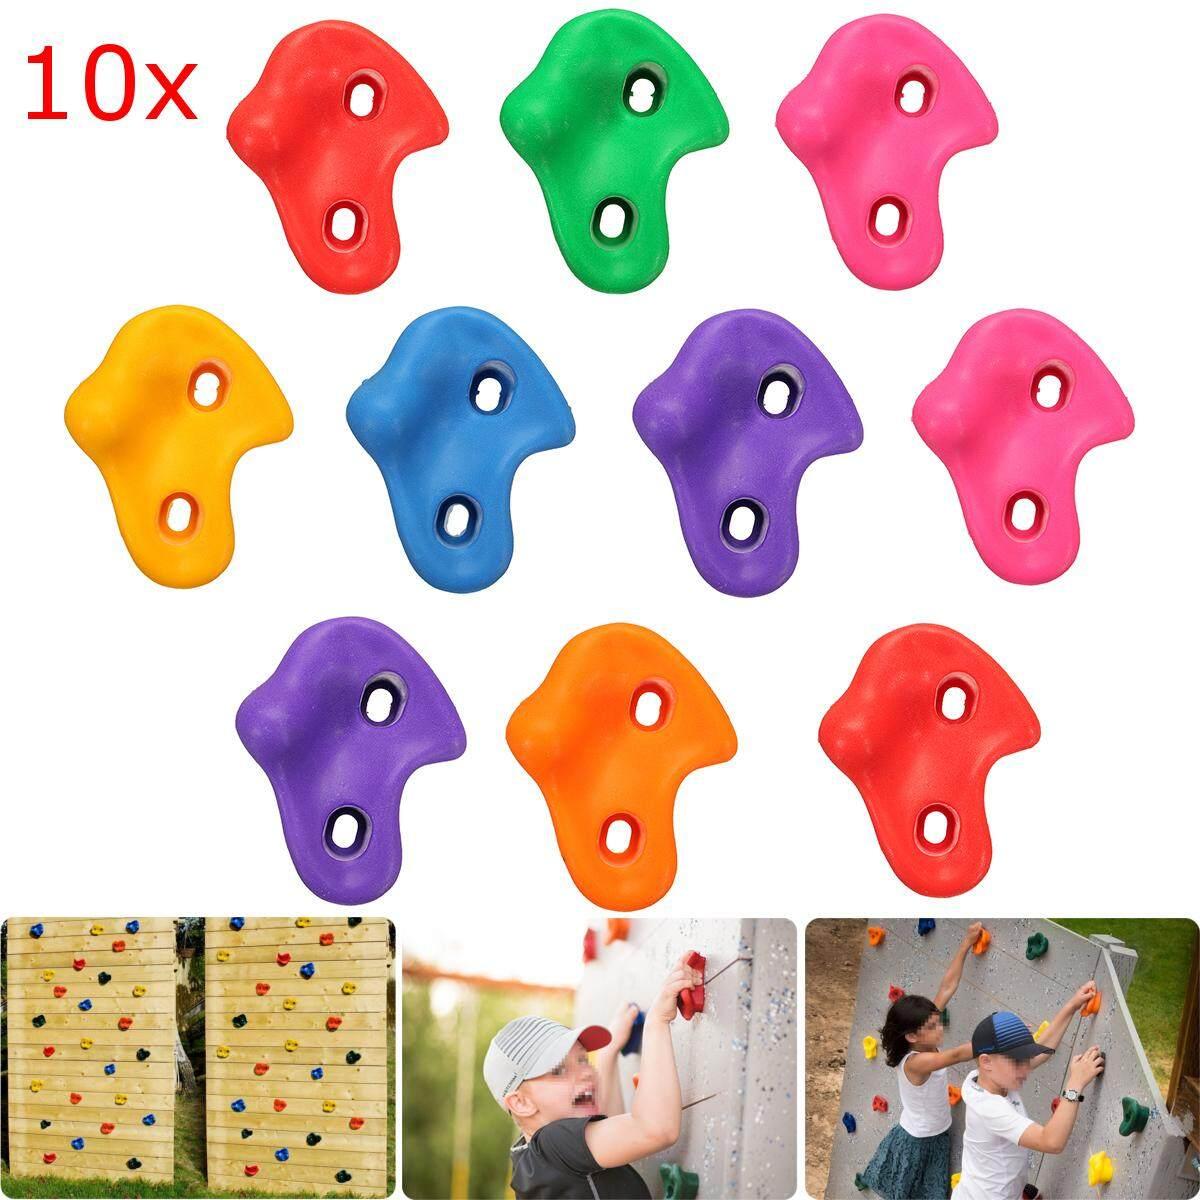 10Pcs Textured Climbing Rock Wall Stones Kids Assorted Color Assorted Kit Bolt